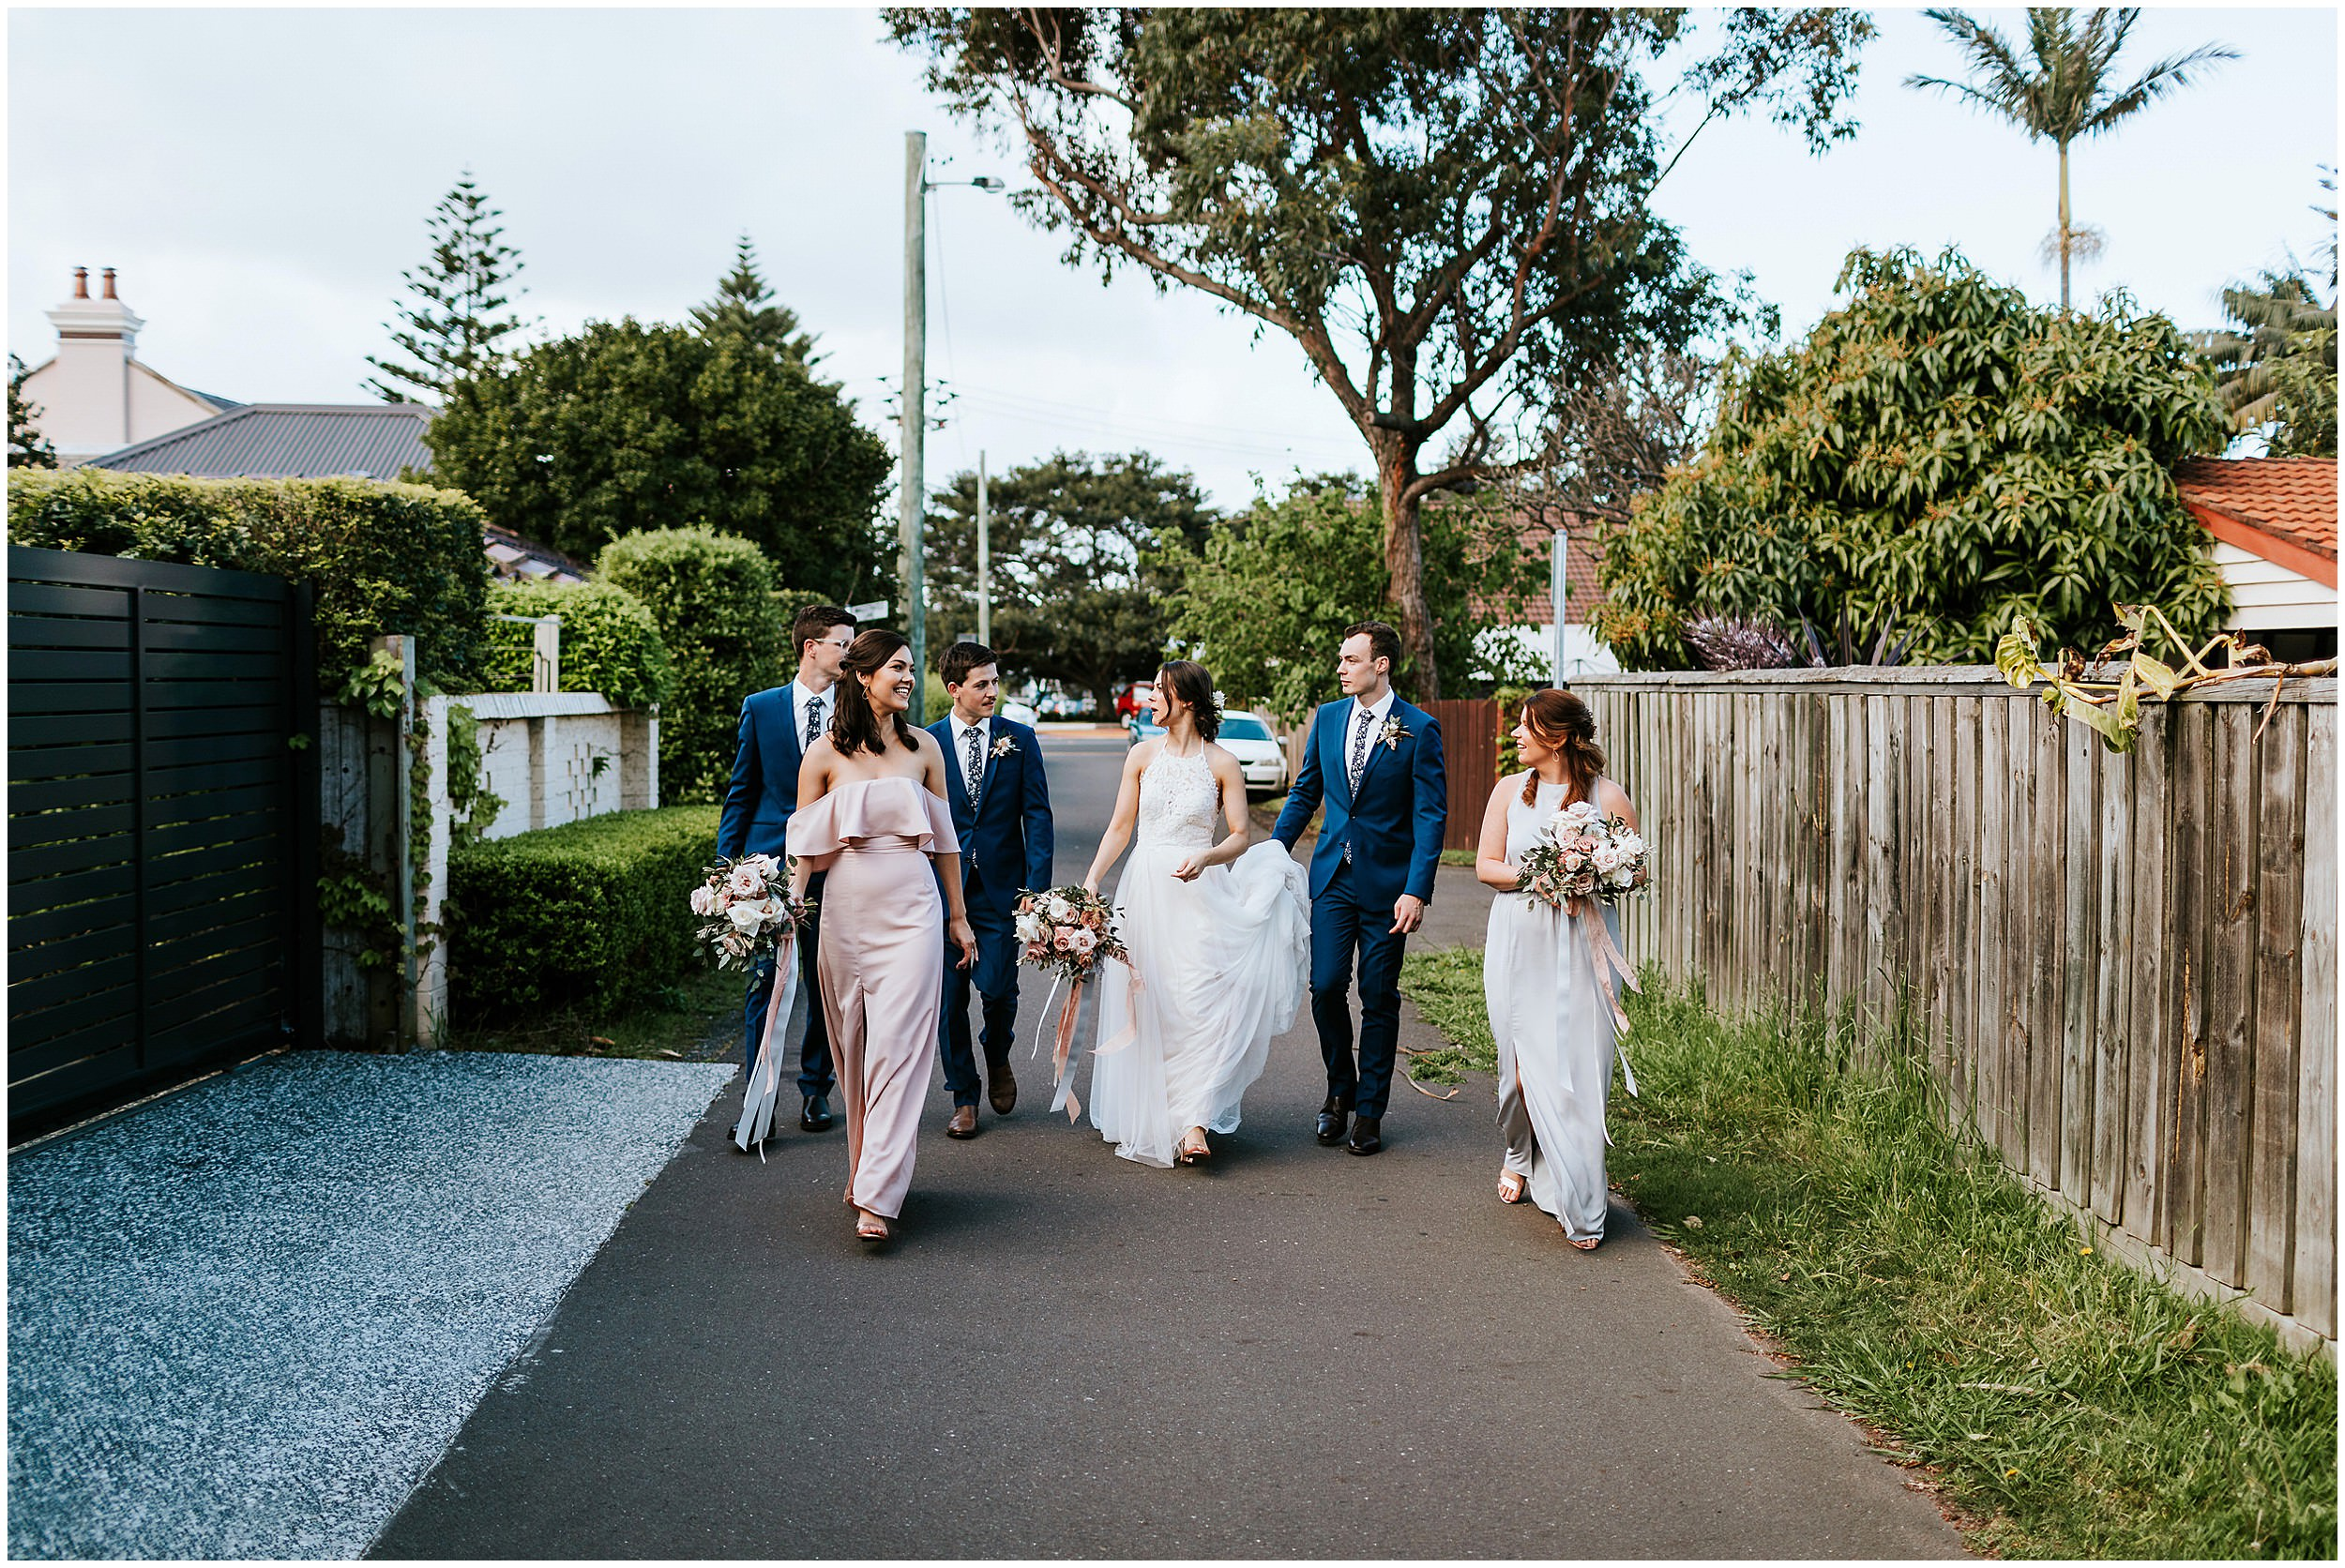 wedding_the_woolshed_steph_zac_0051.jpg